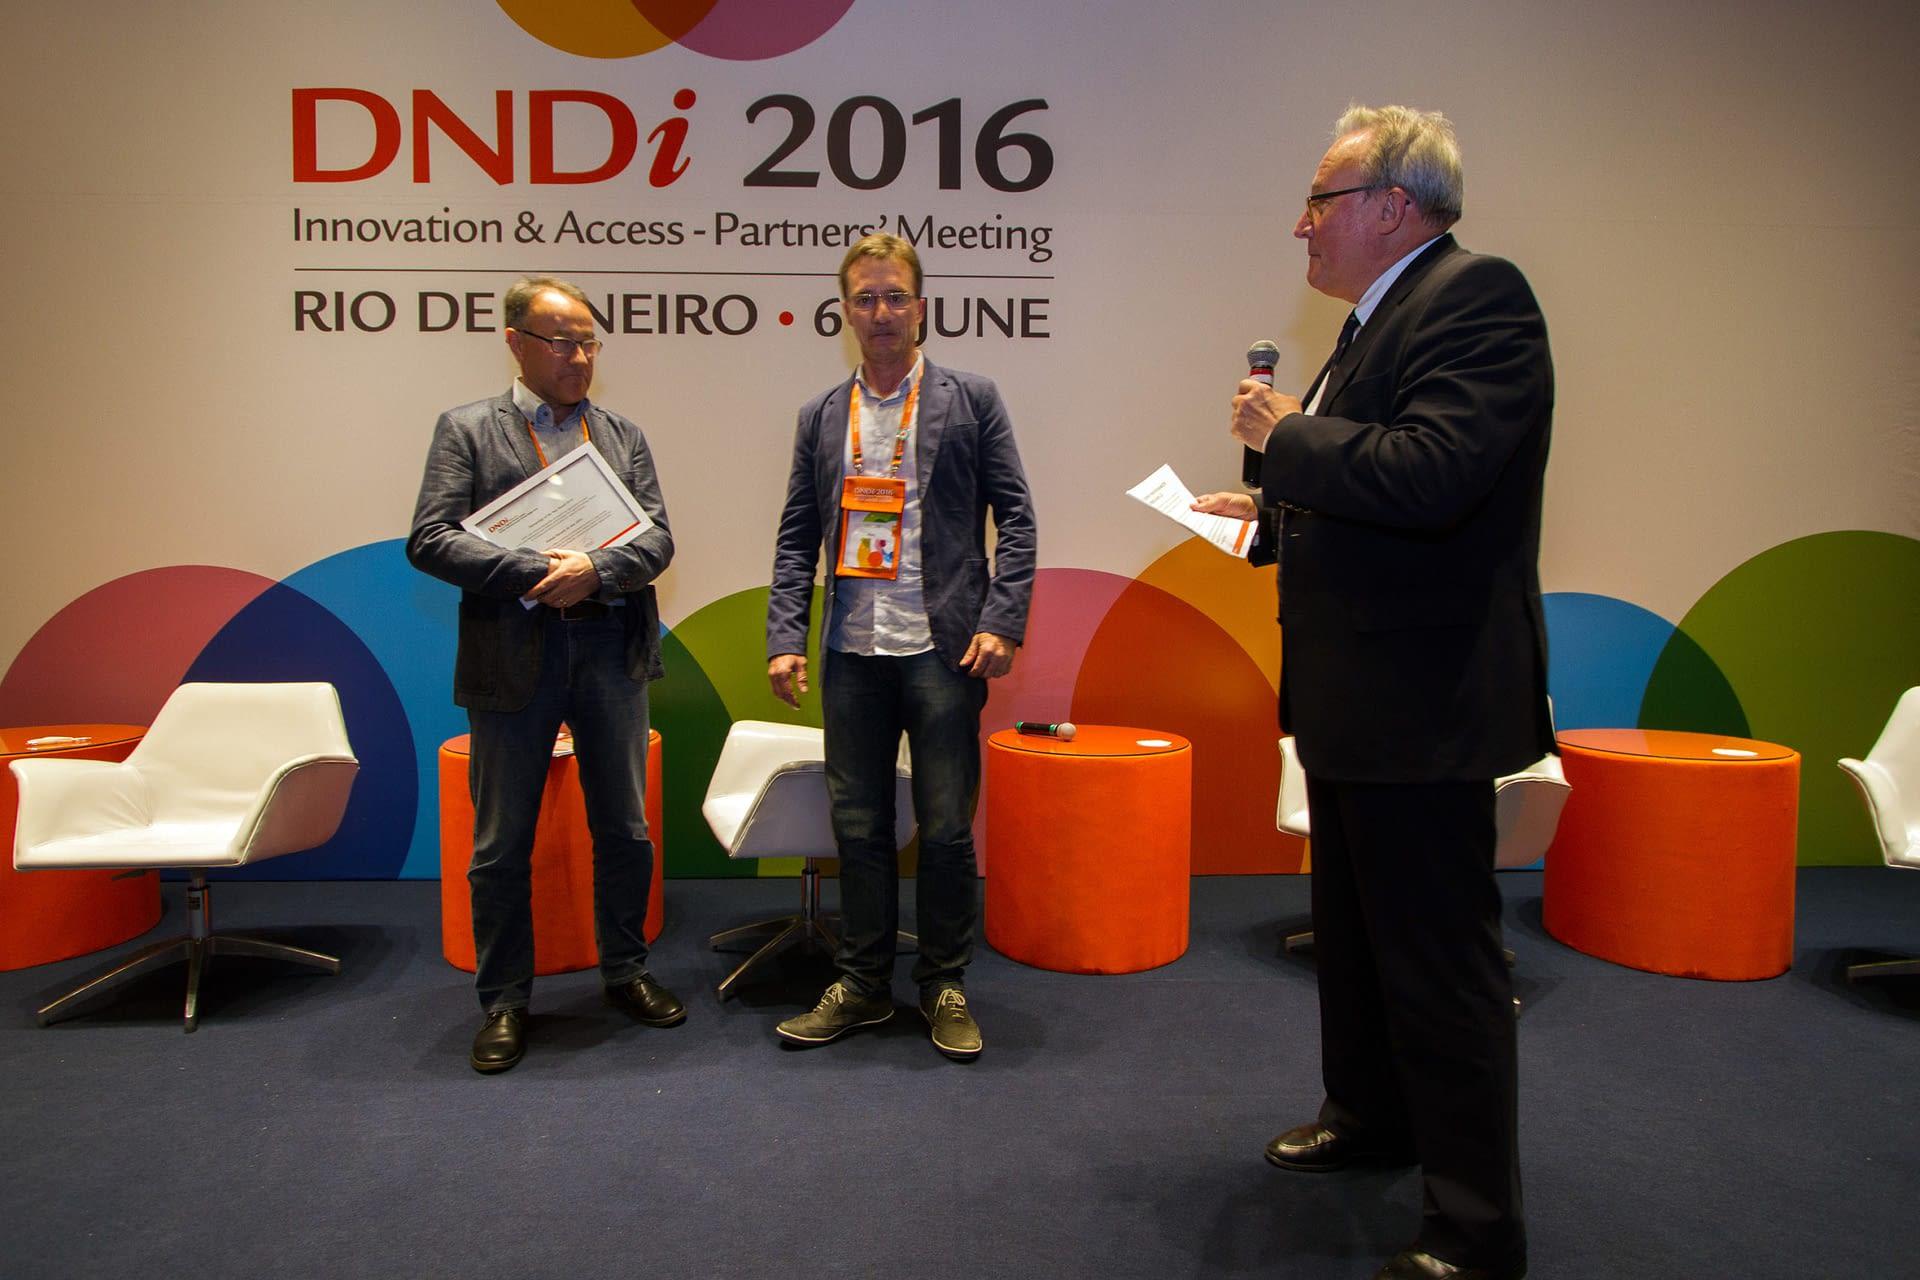 Prizegiving DNDi 2016 Partners' Meeting, Rio, Brazil